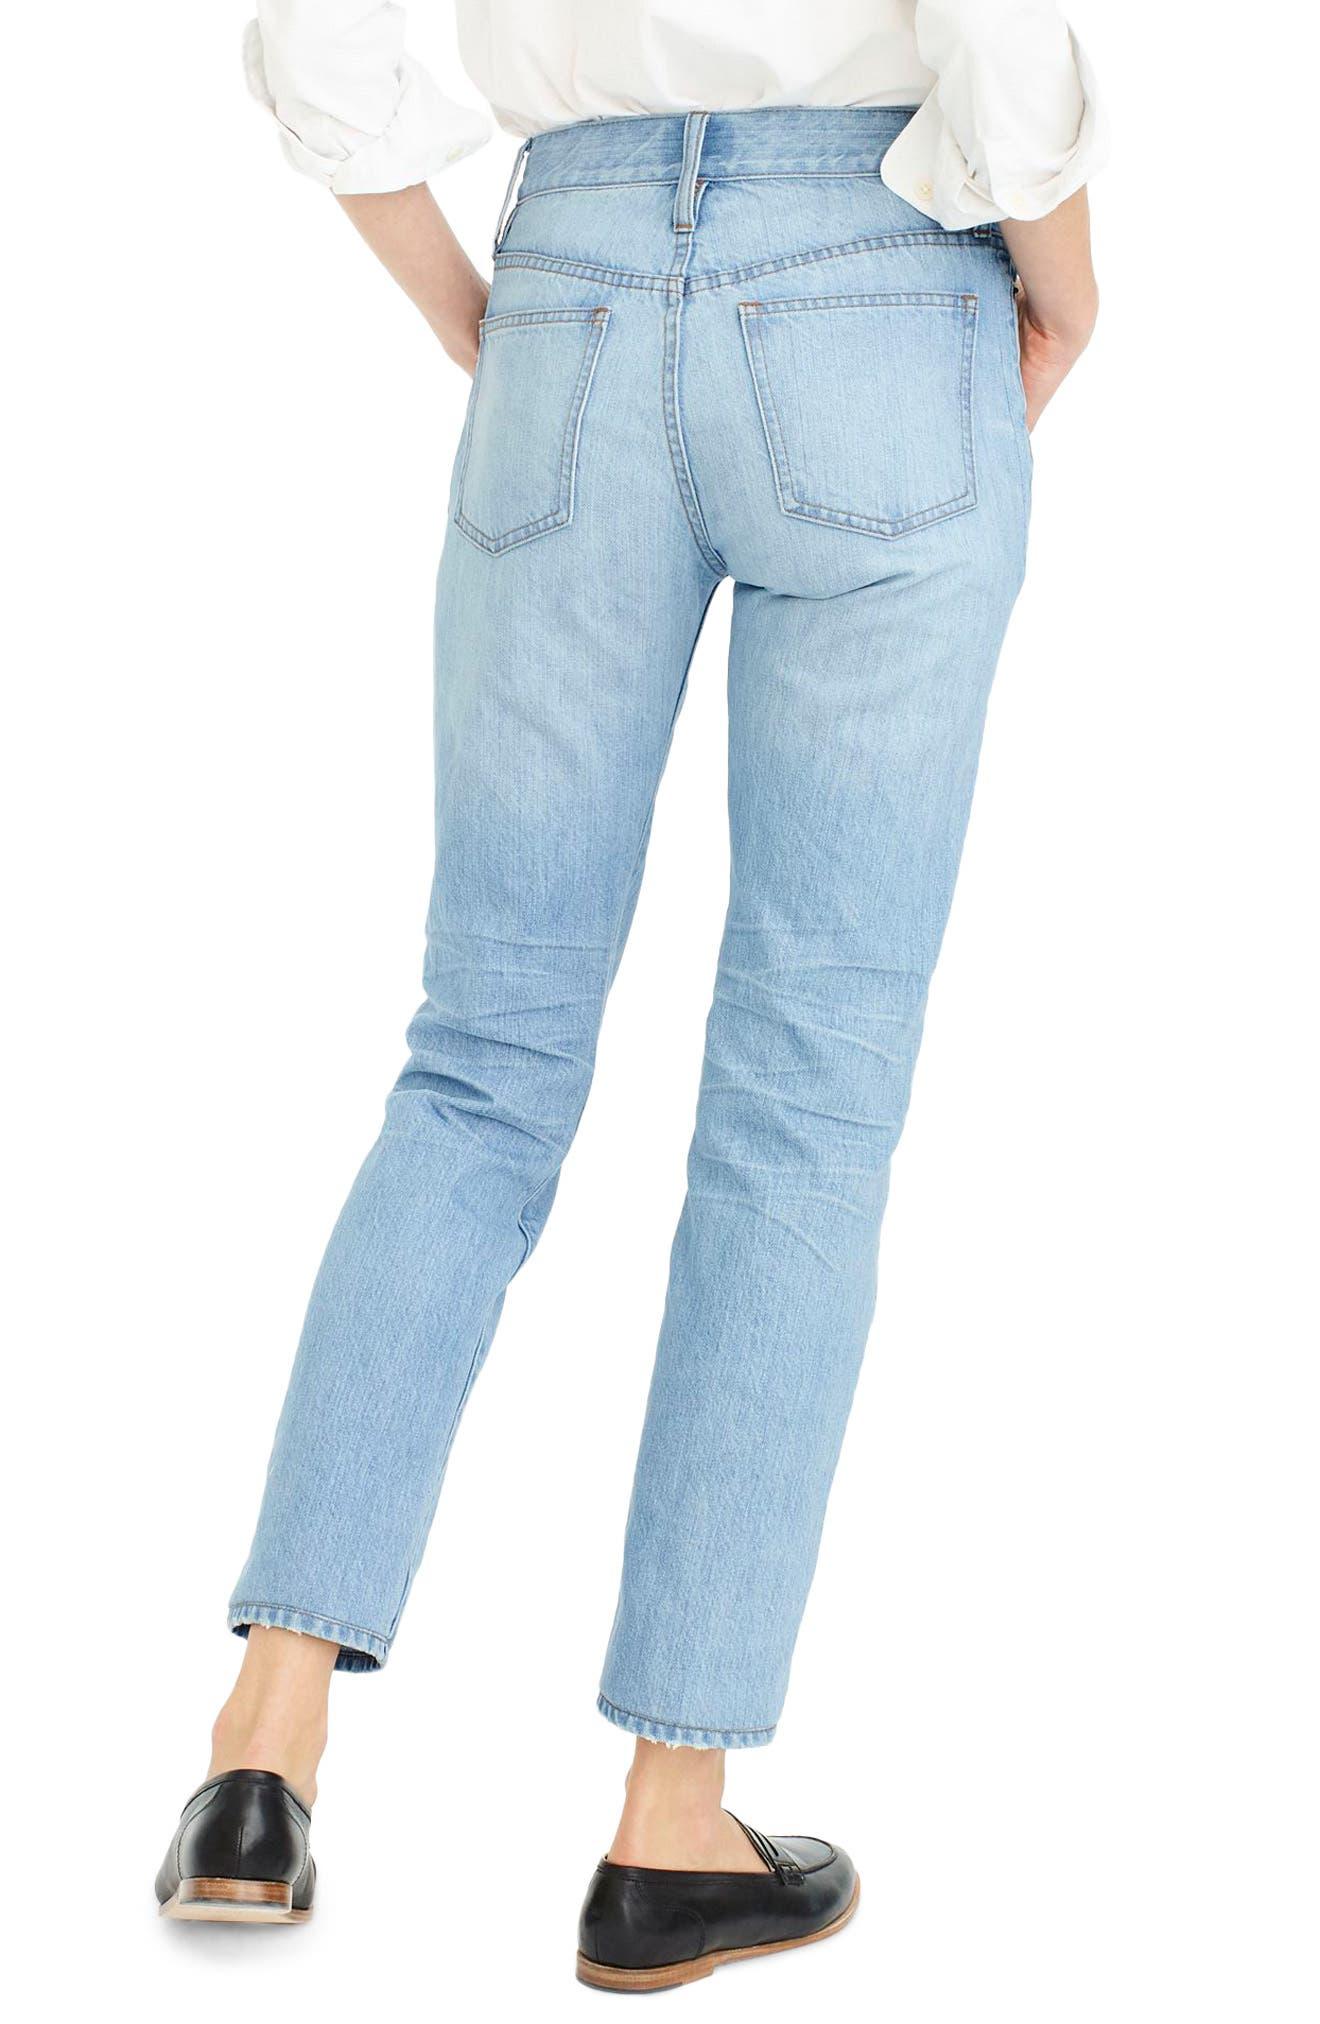 Retro Big Idea Jeans,                             Alternate thumbnail 2, color,                             Fern Wash